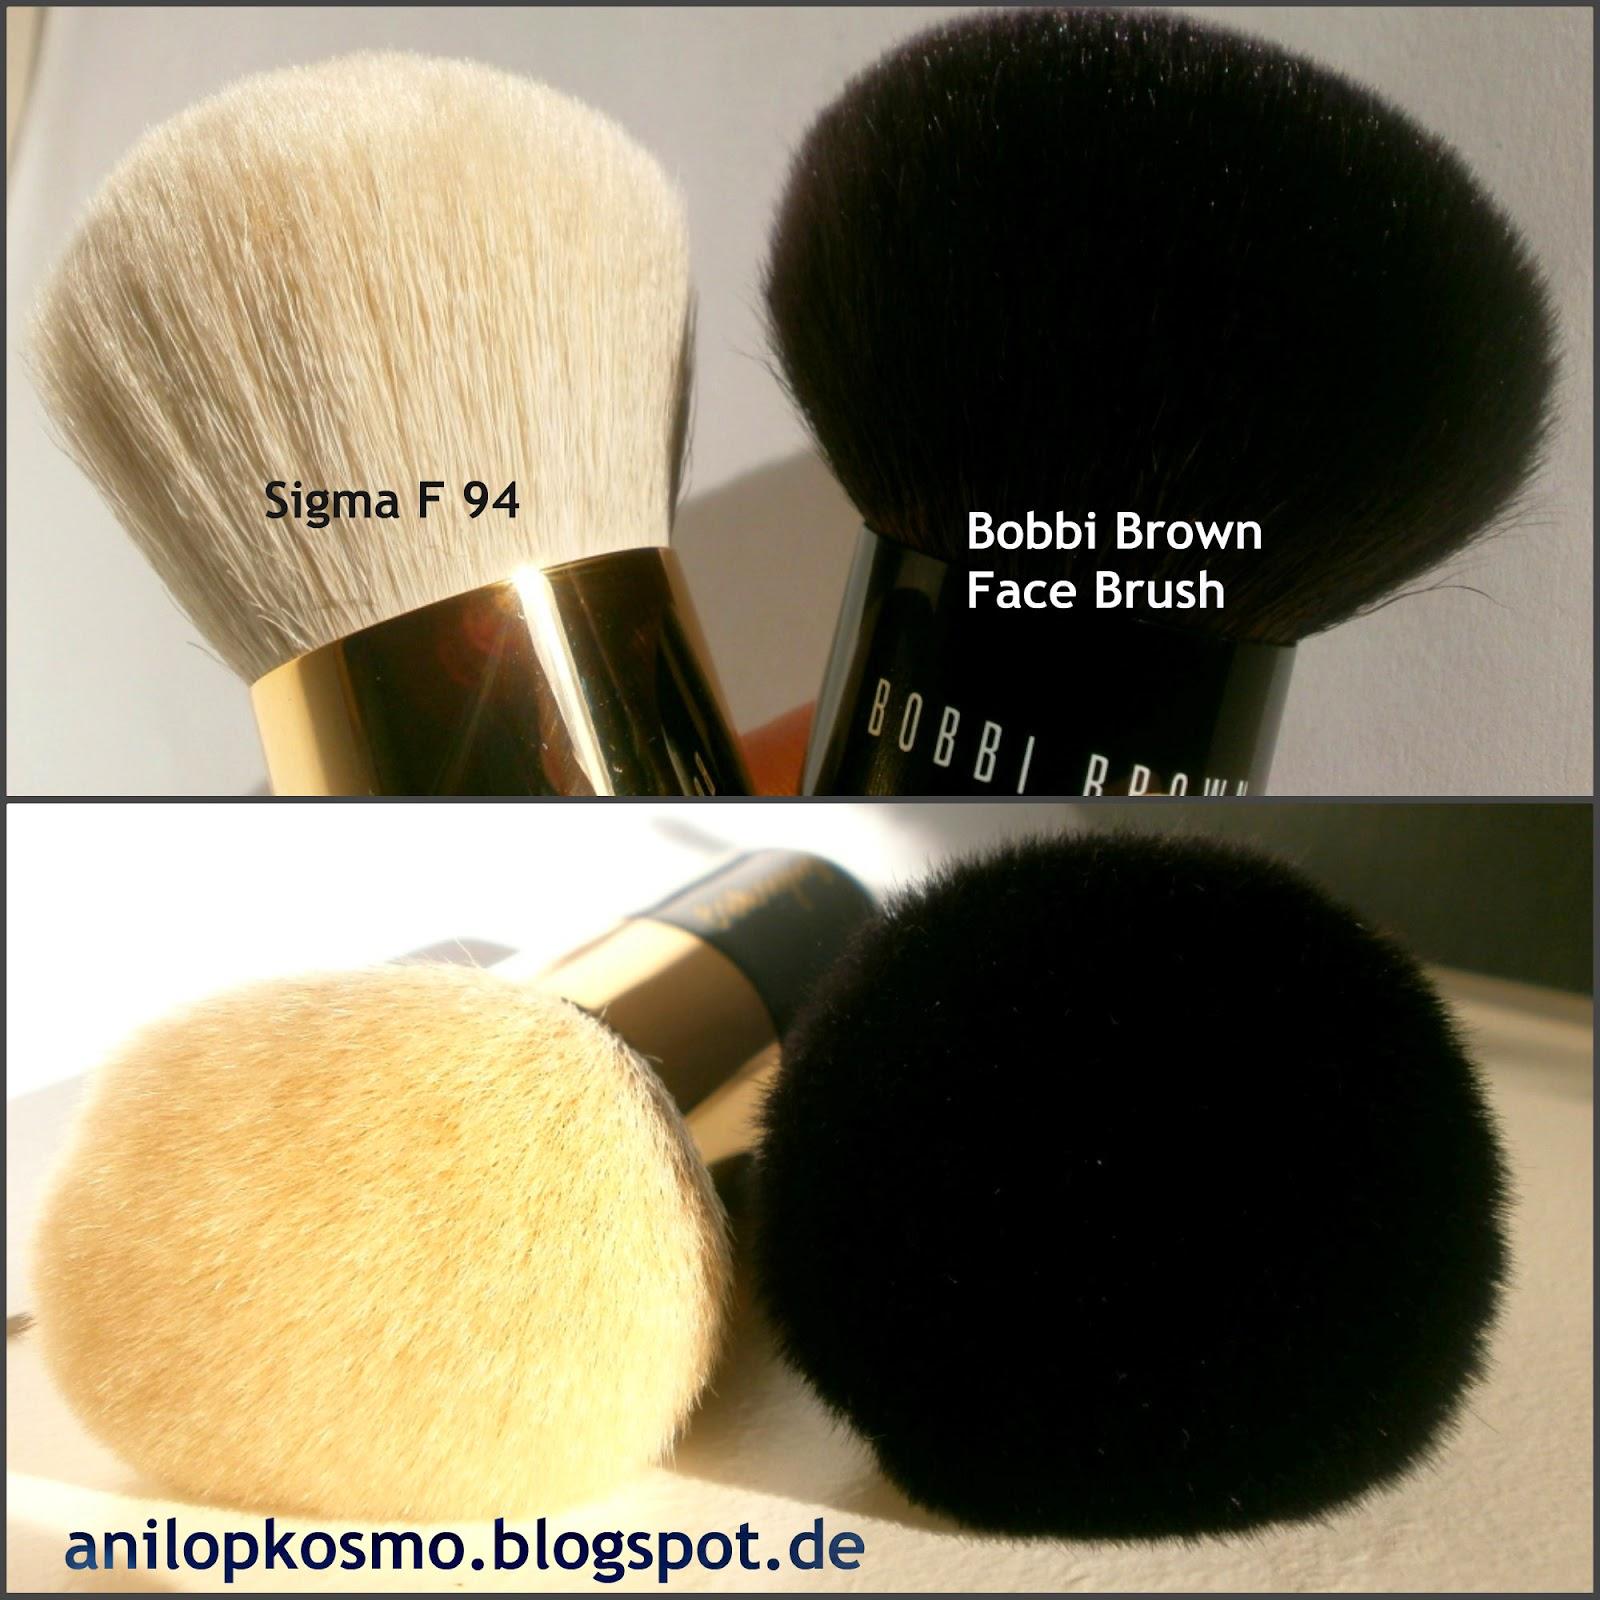 Sigma Extravaganza Kabuki F94 , кабуки Бобби Браун отзыв, сравнение